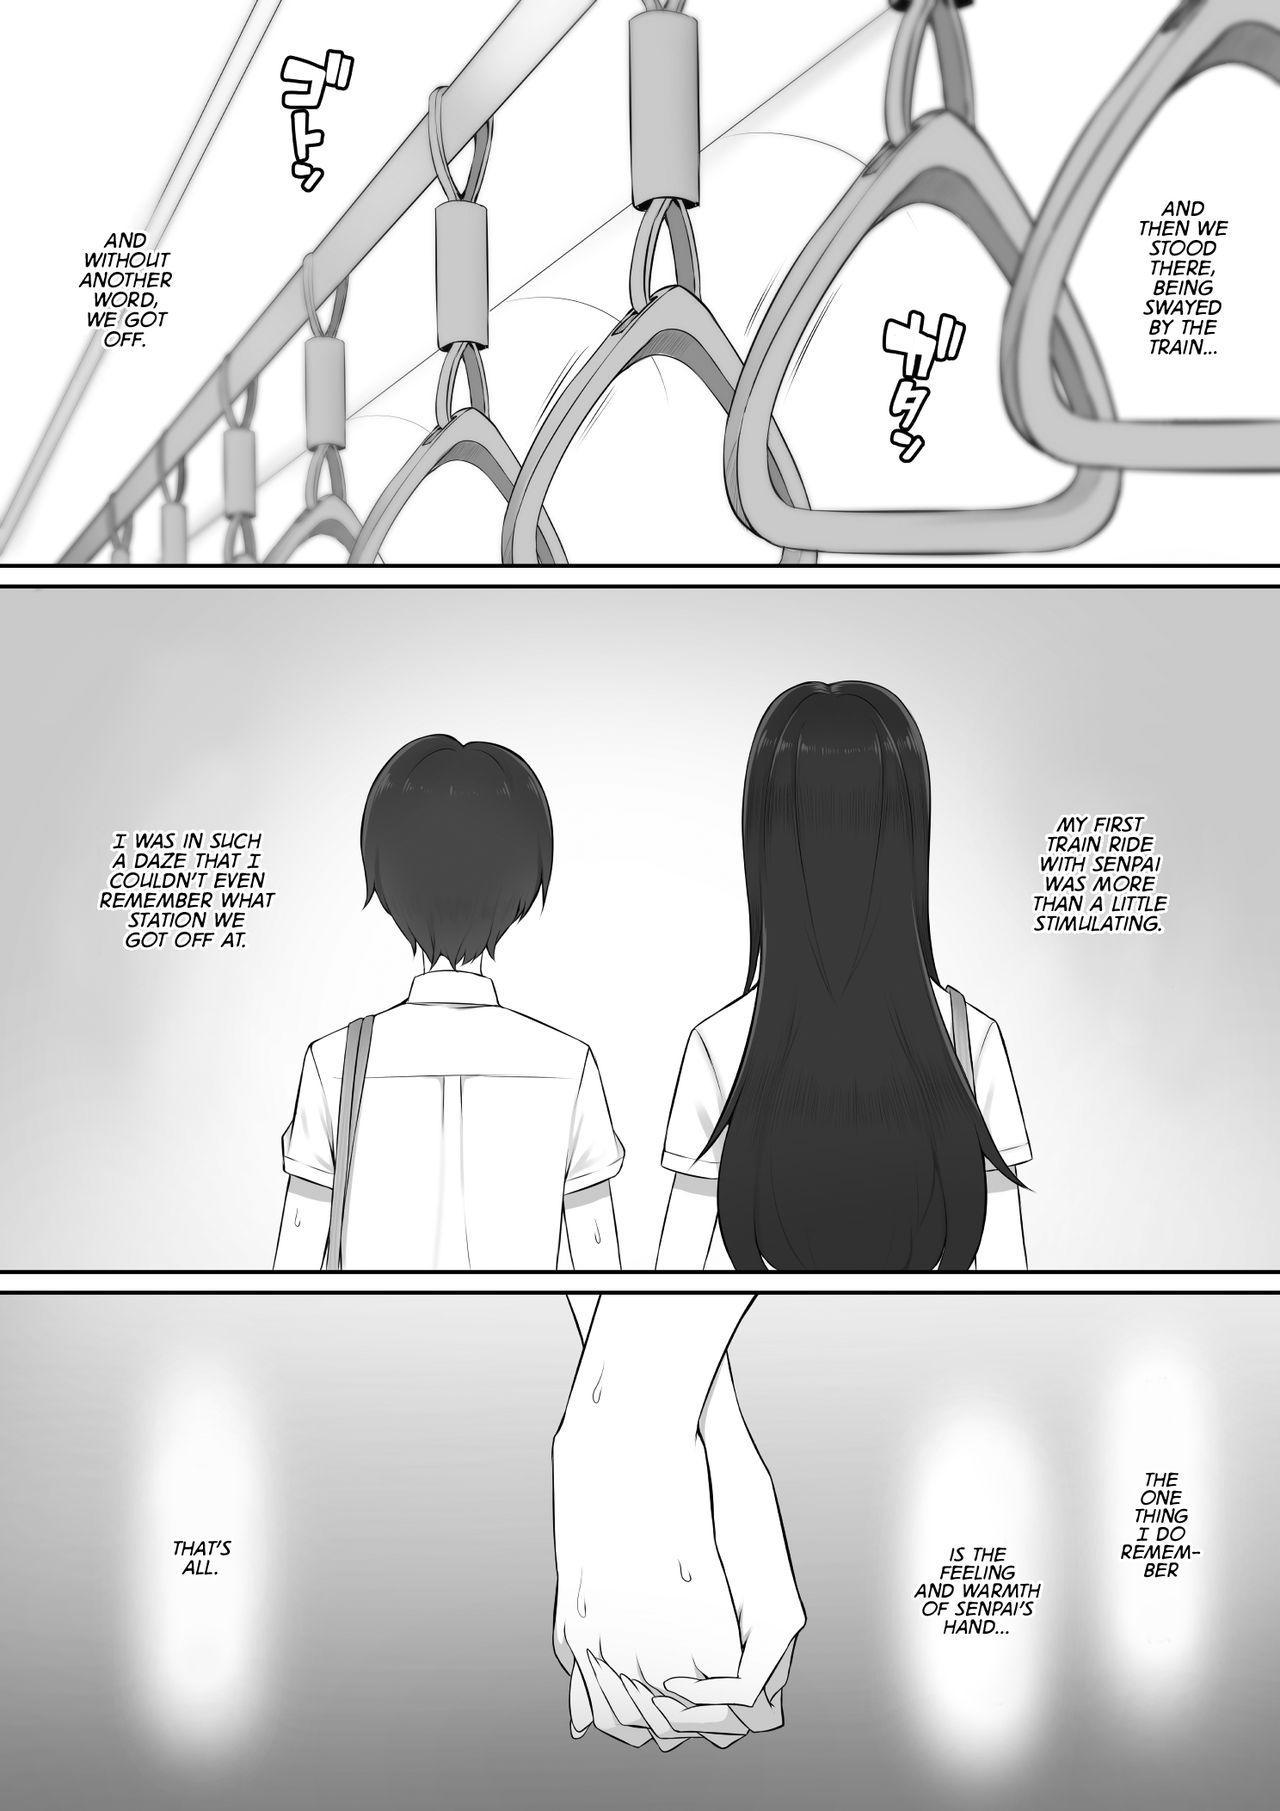 Houkago, Akogare no Senpai ni Tsurerarete- |The Senpai That I Yearn For Brought Me To Her House After School 13